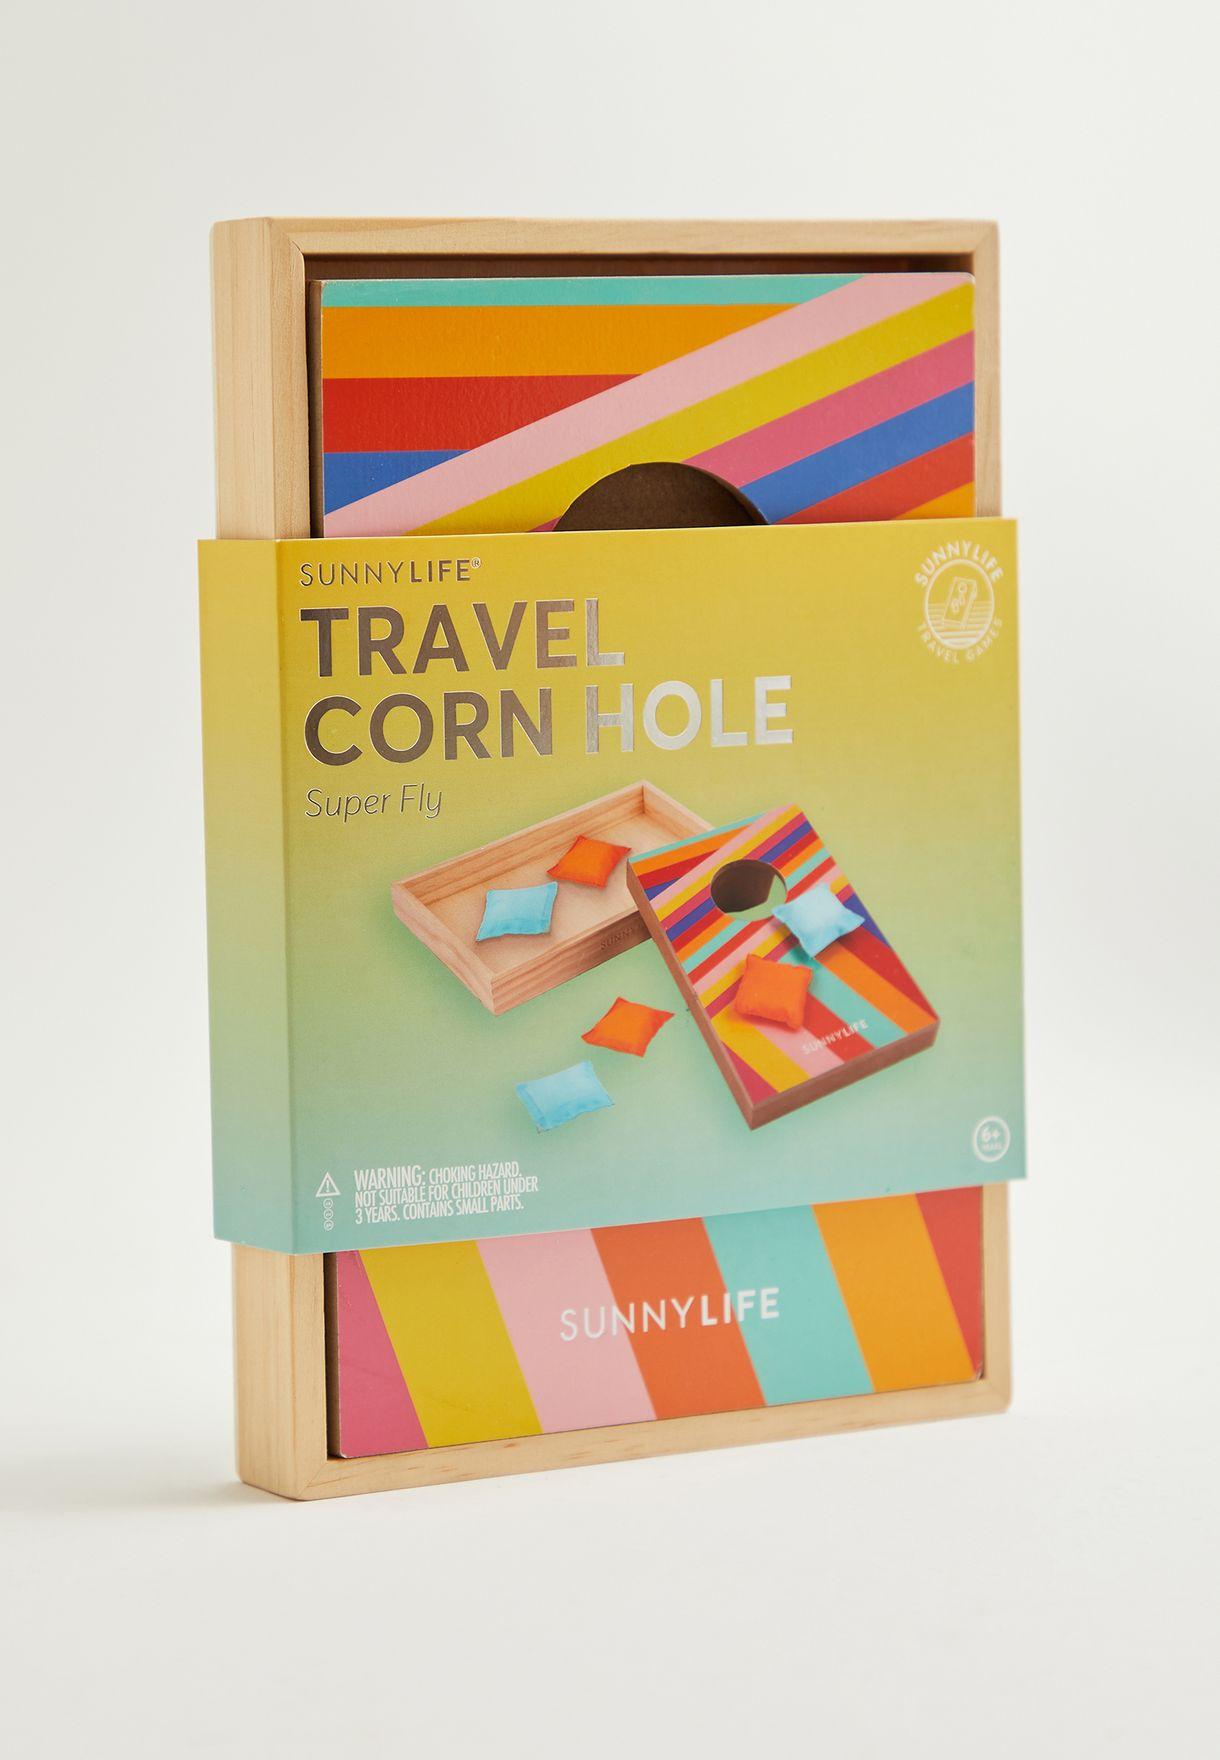 Travel Corn Hole Super Fly